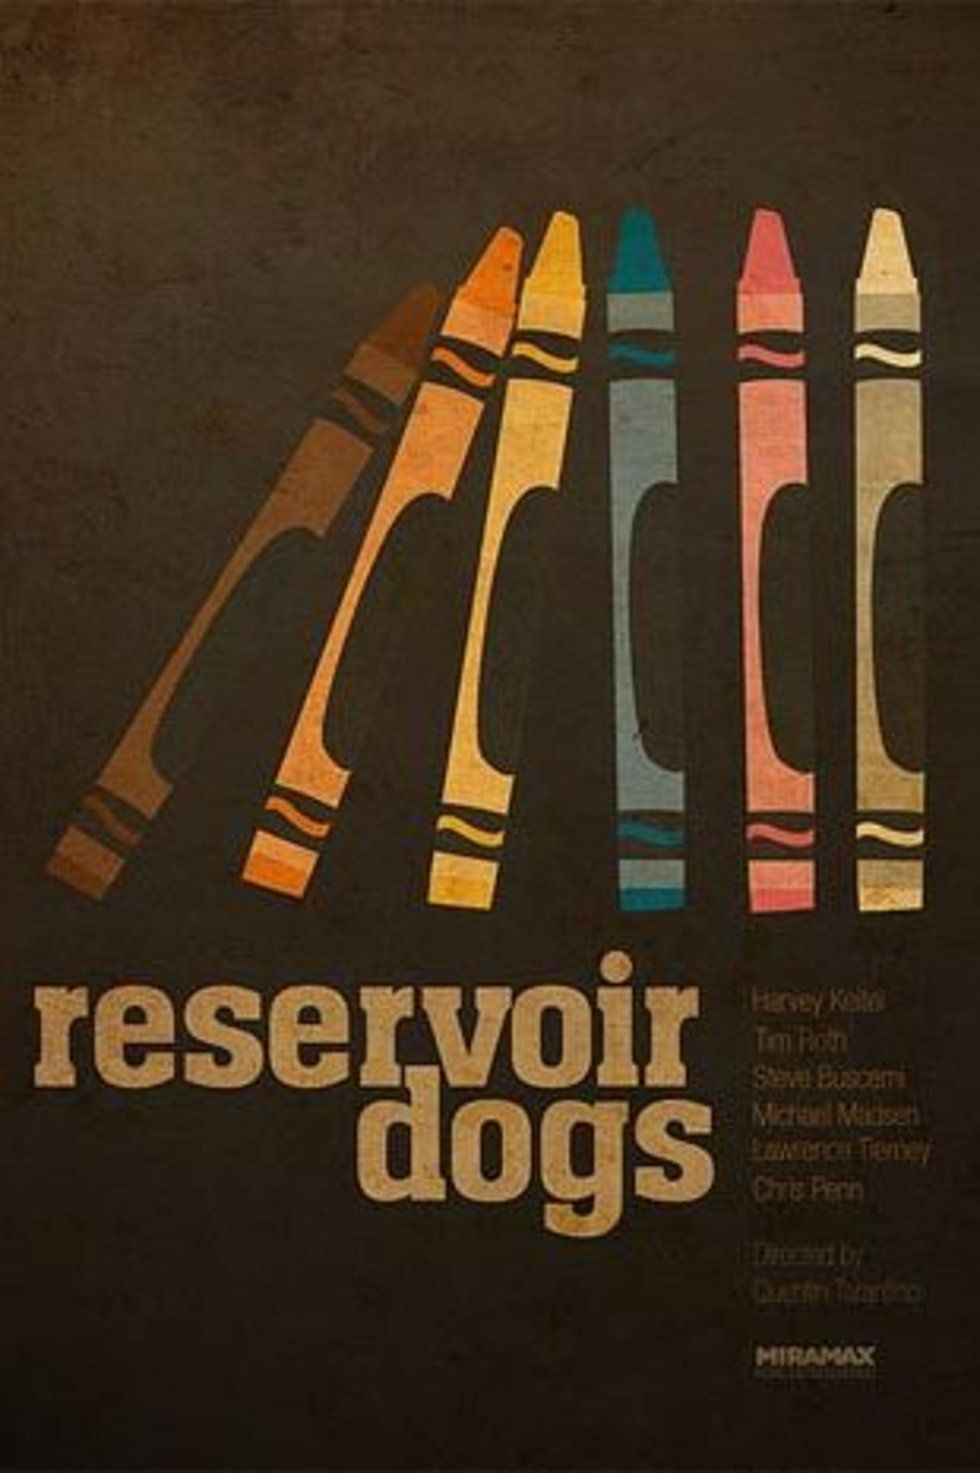 RESERVOIR DOGS Movie PHOTO Print POSTER Textless Film Art Quentin Tarantino 003